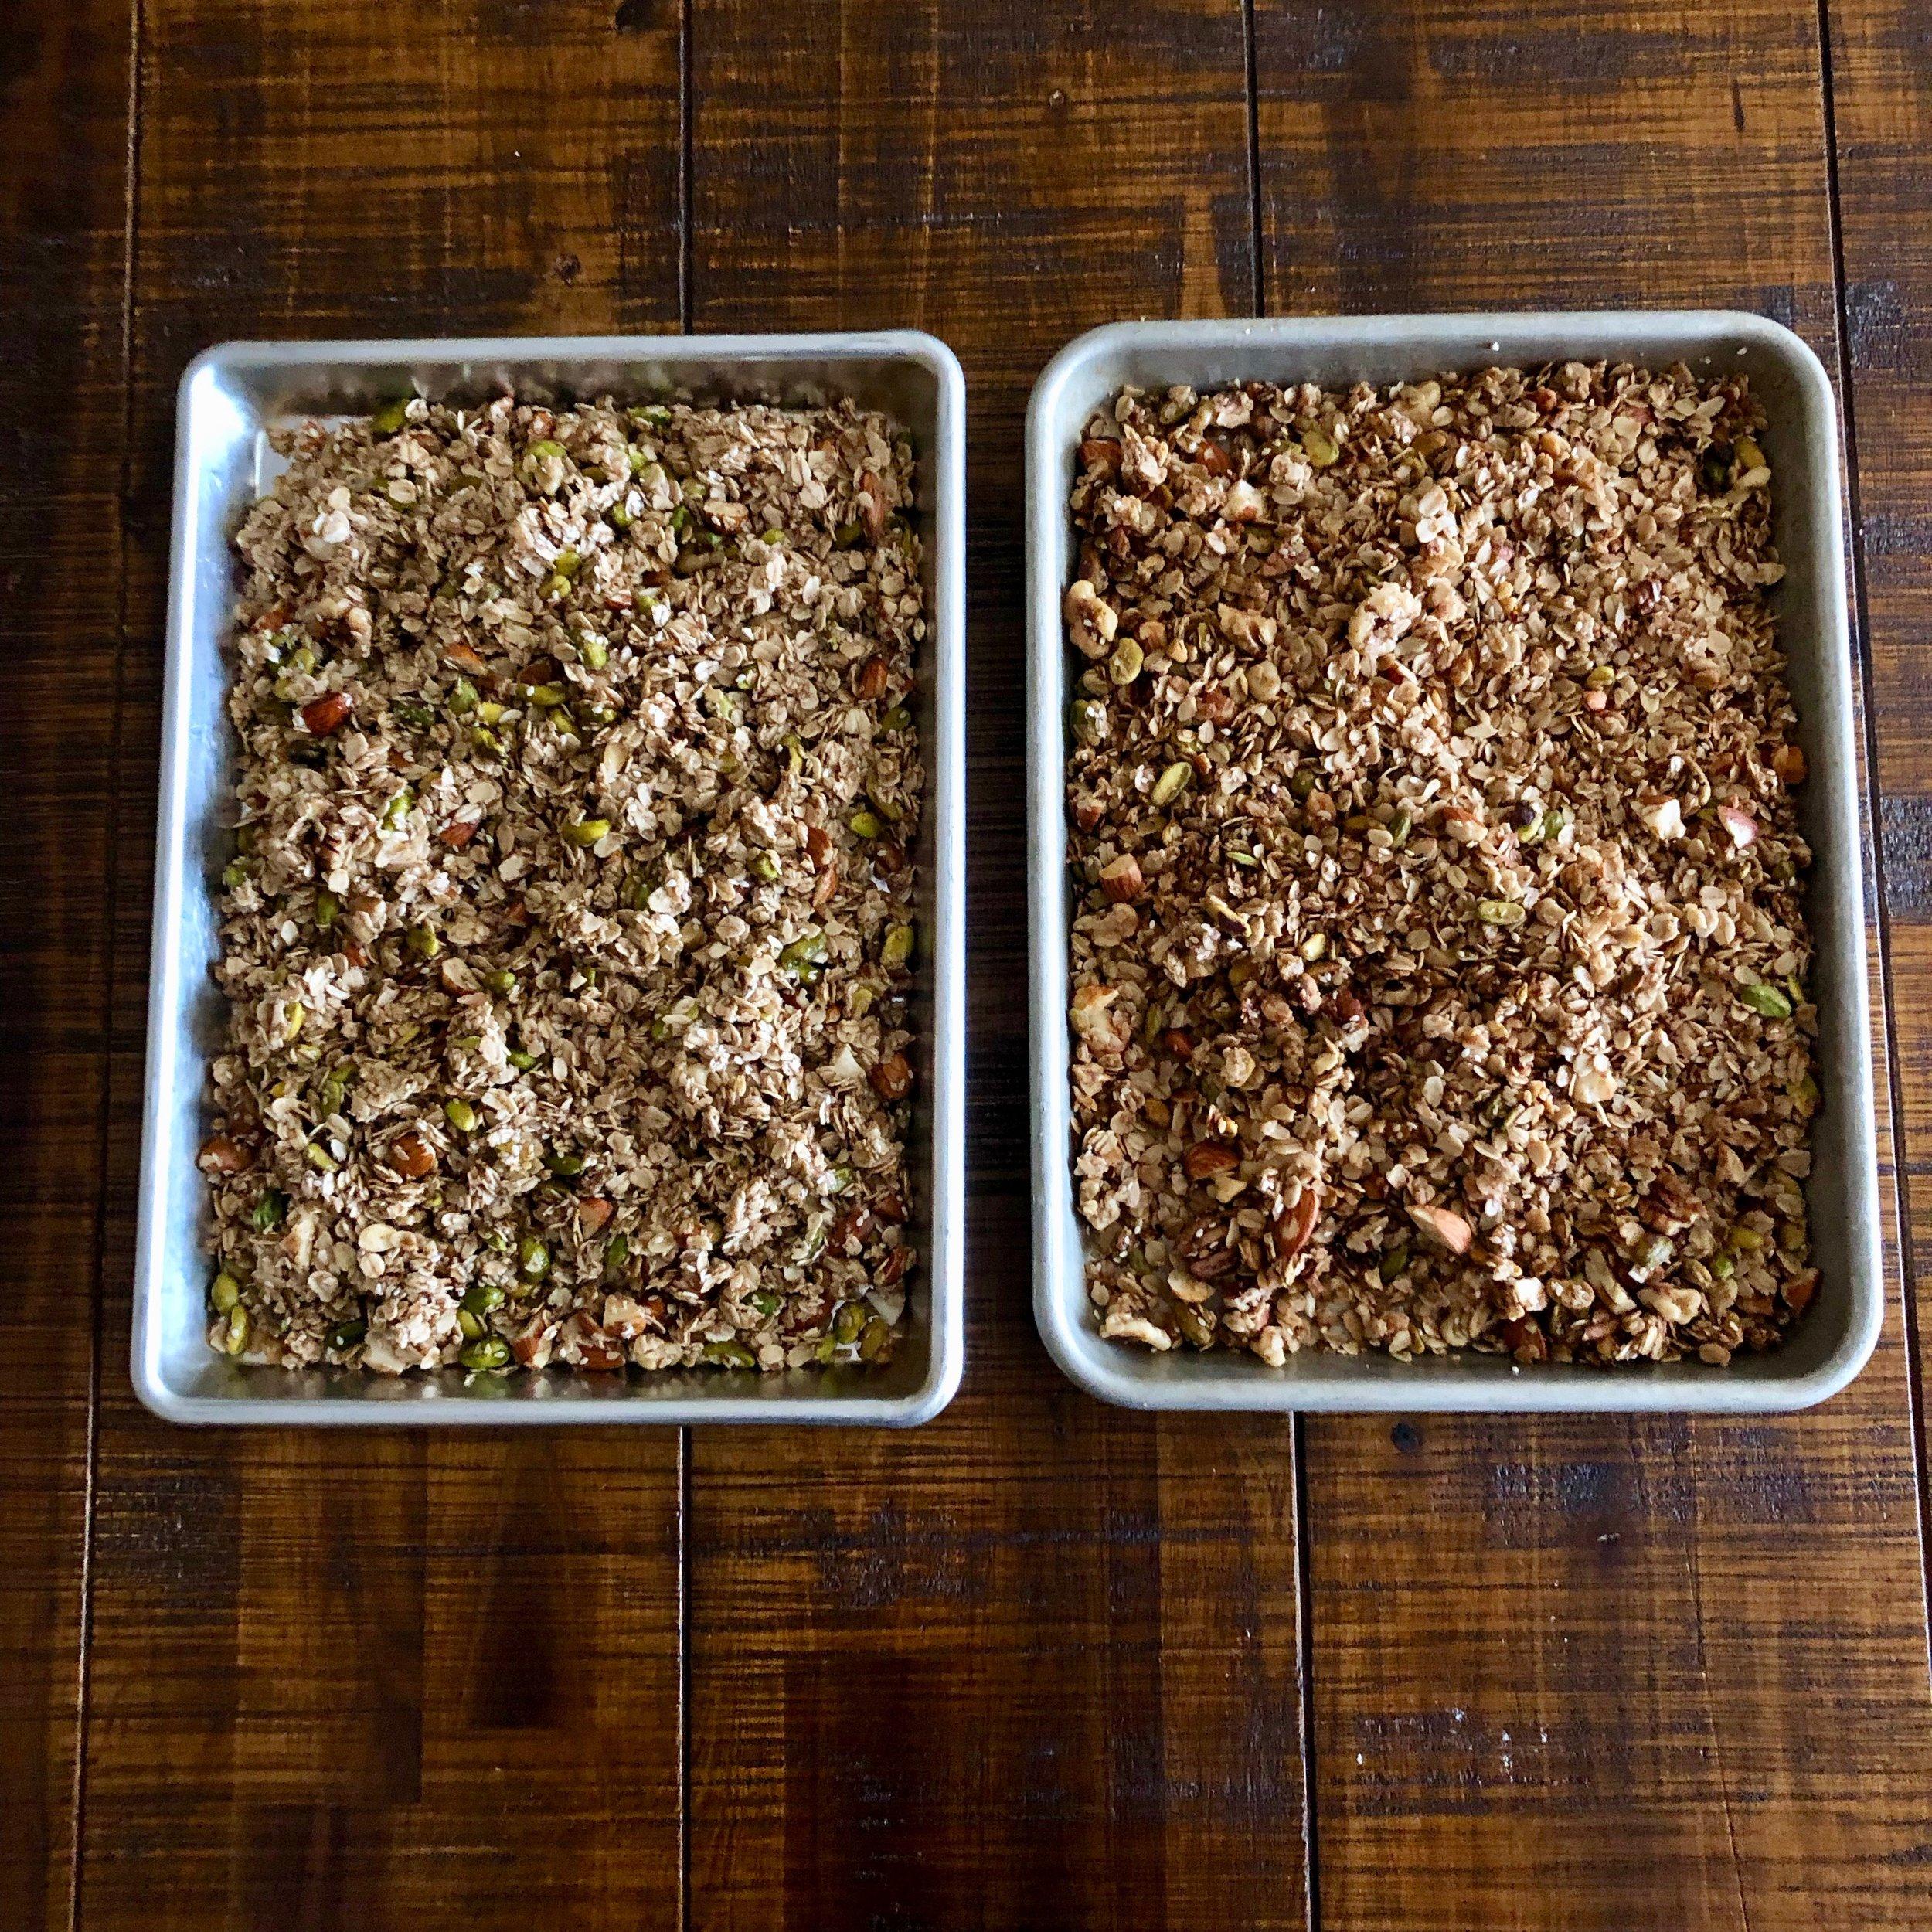 Bake until light golden brown (right)